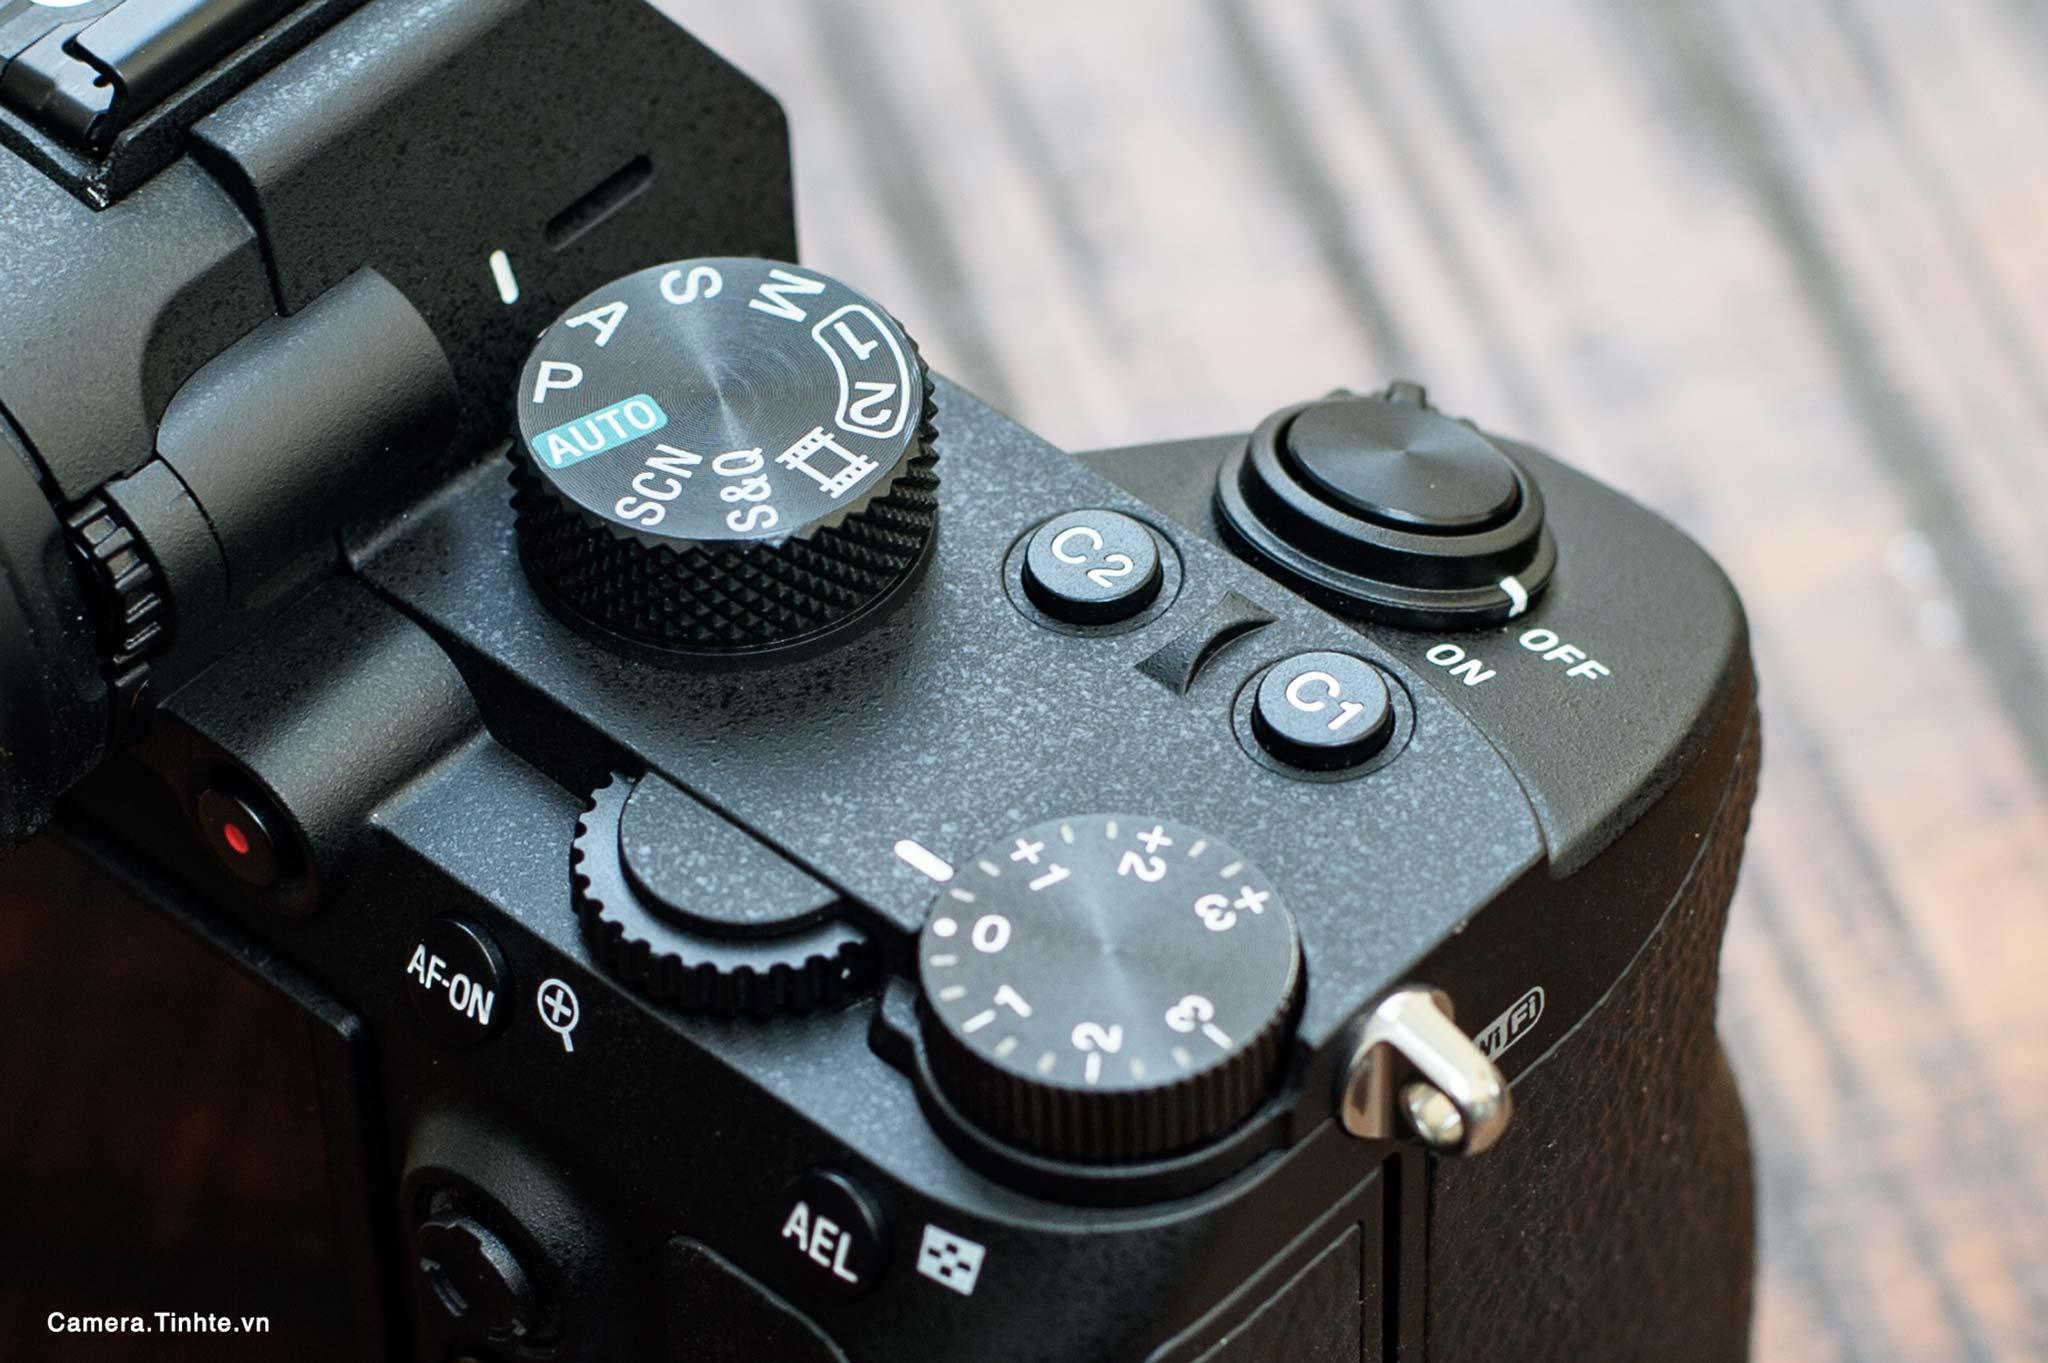 Camera.Tinhte.vn_Sony-A7-III_NON_9641.jpg